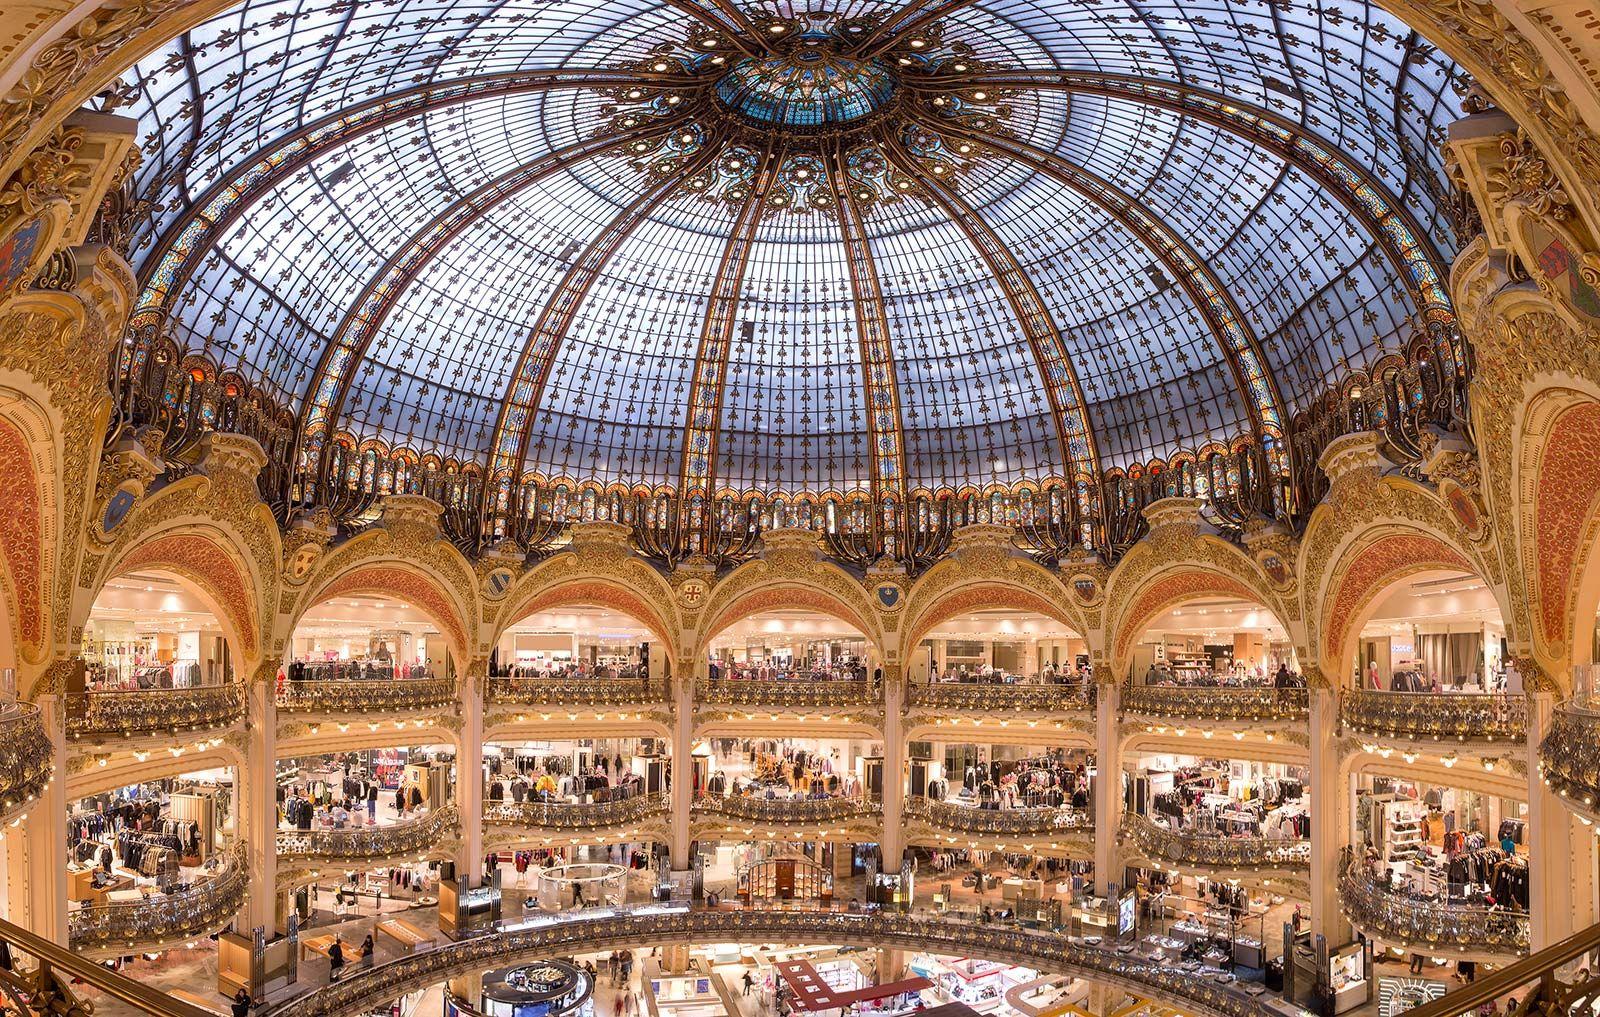 Retail Therapy Wonders And More At The Galeries Lafayette Compras Em Paris Loja De Departamento Turismo